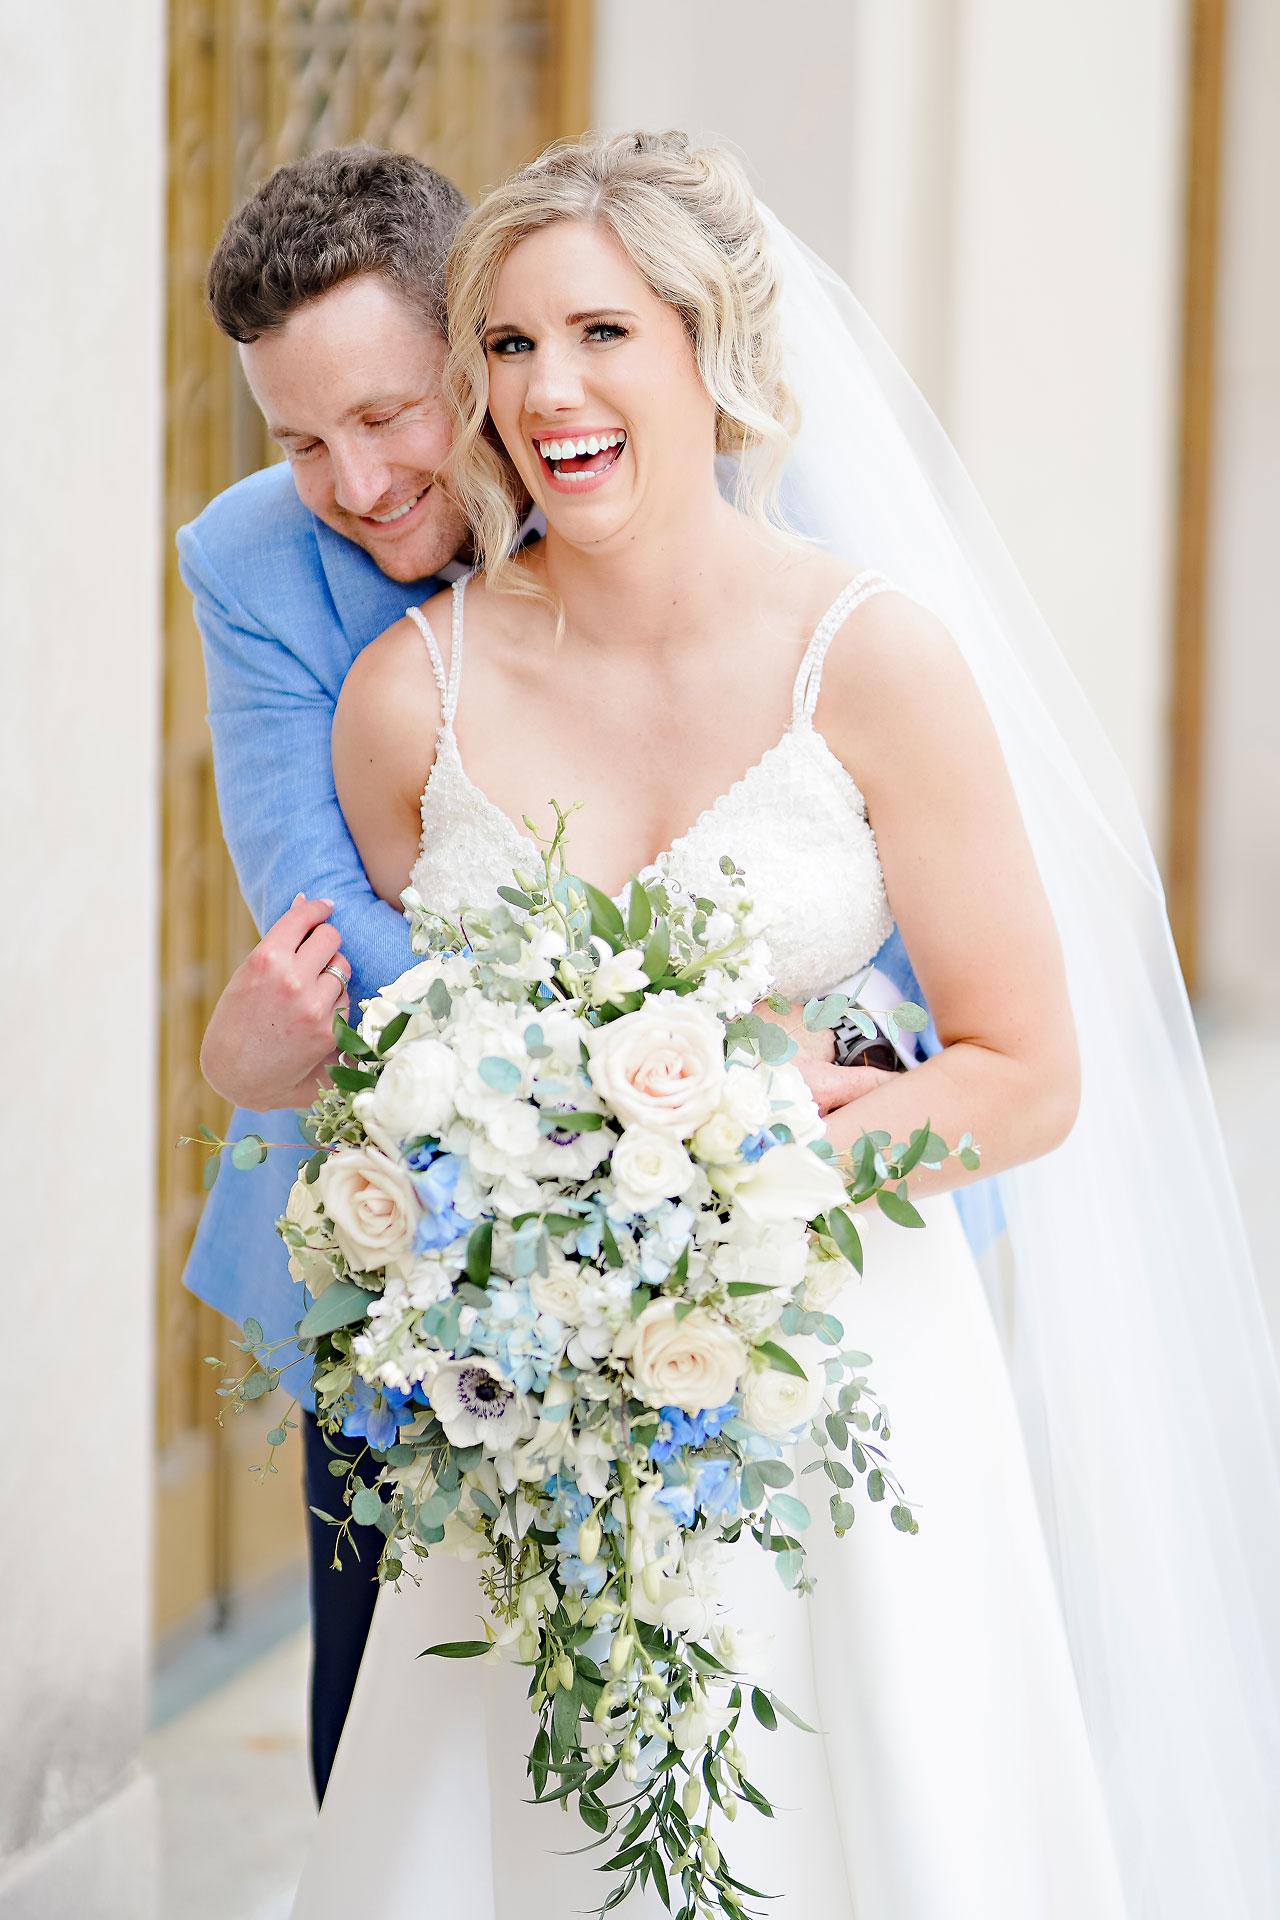 Sammi Jack Regions Tower JPS Events Indianapolis Wedding 071